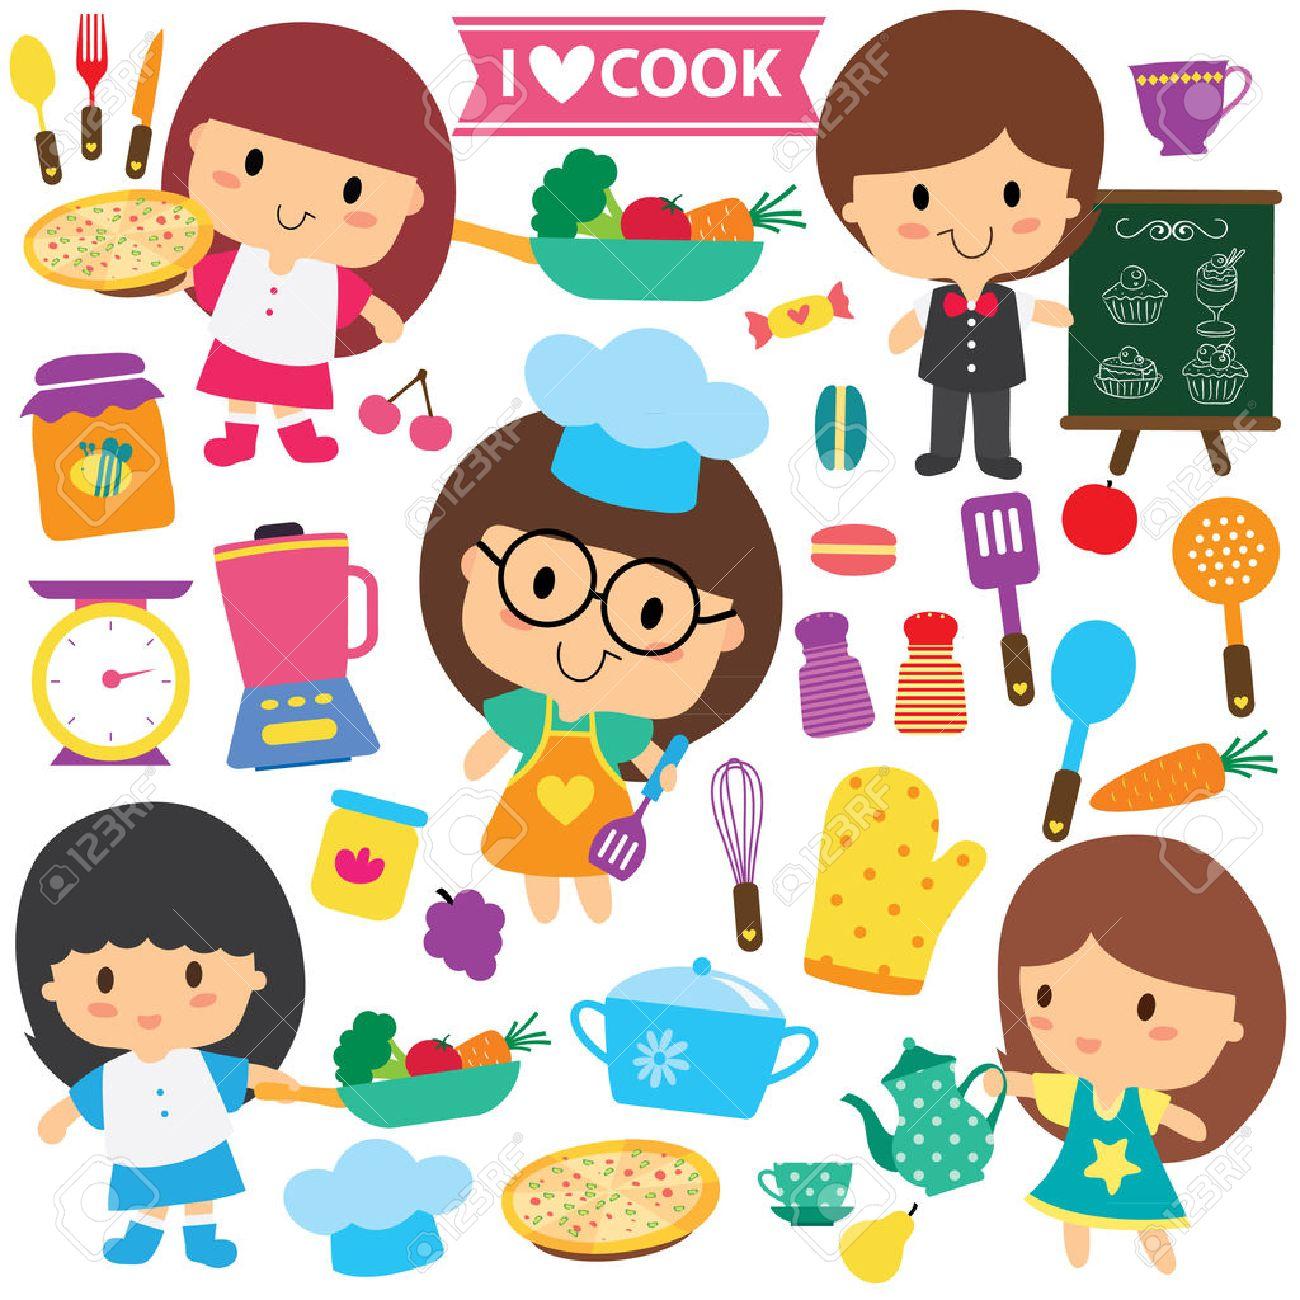 Play kitchen clip art - Chef Kids And Kitchen Elements Clip Art Set Stock Vector 32608320